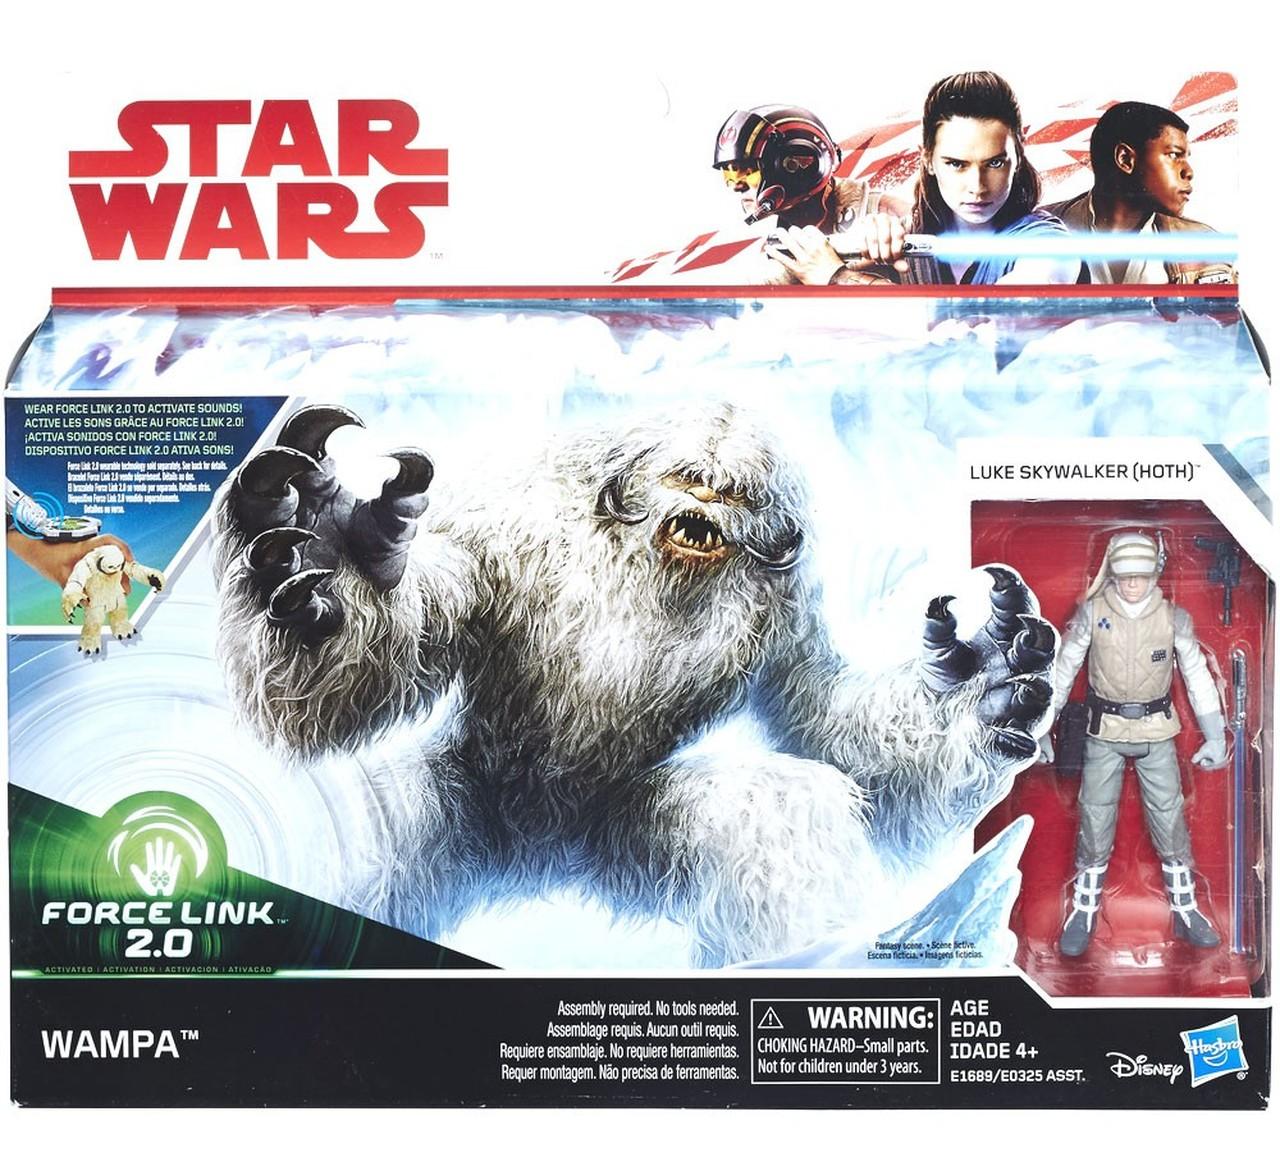 Star Wars Force Link 2.0 sets € 4.99 @ Kruidvat